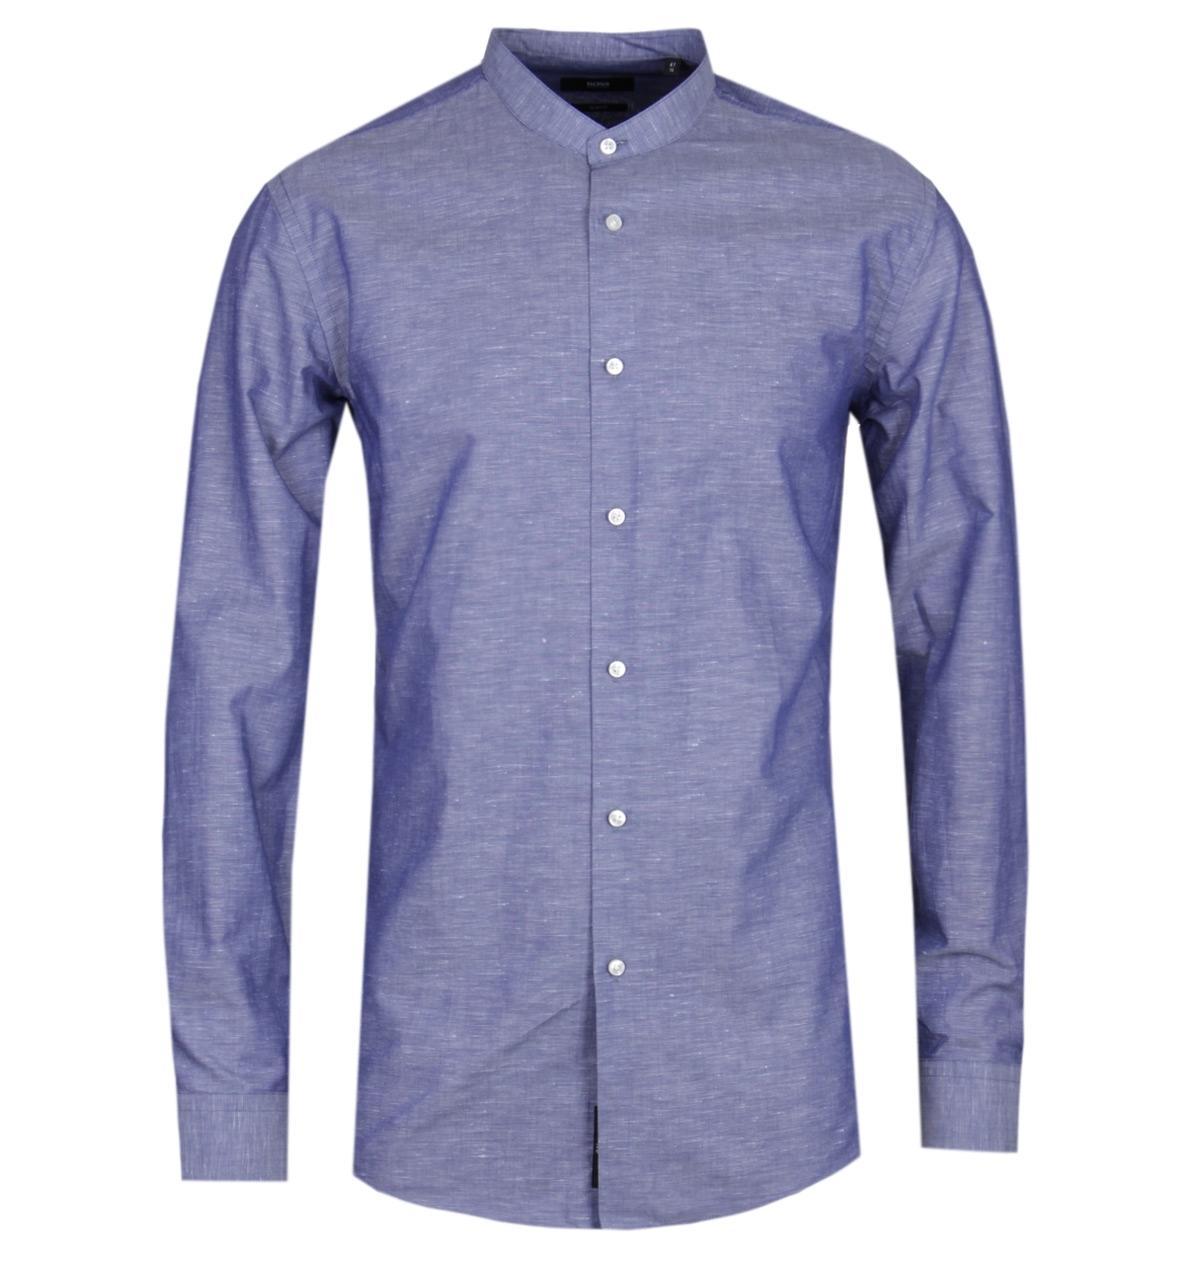 0199480ce Lyst - BOSS Jordi Slim Fit Navy Grandad Shirt in Blue for Men